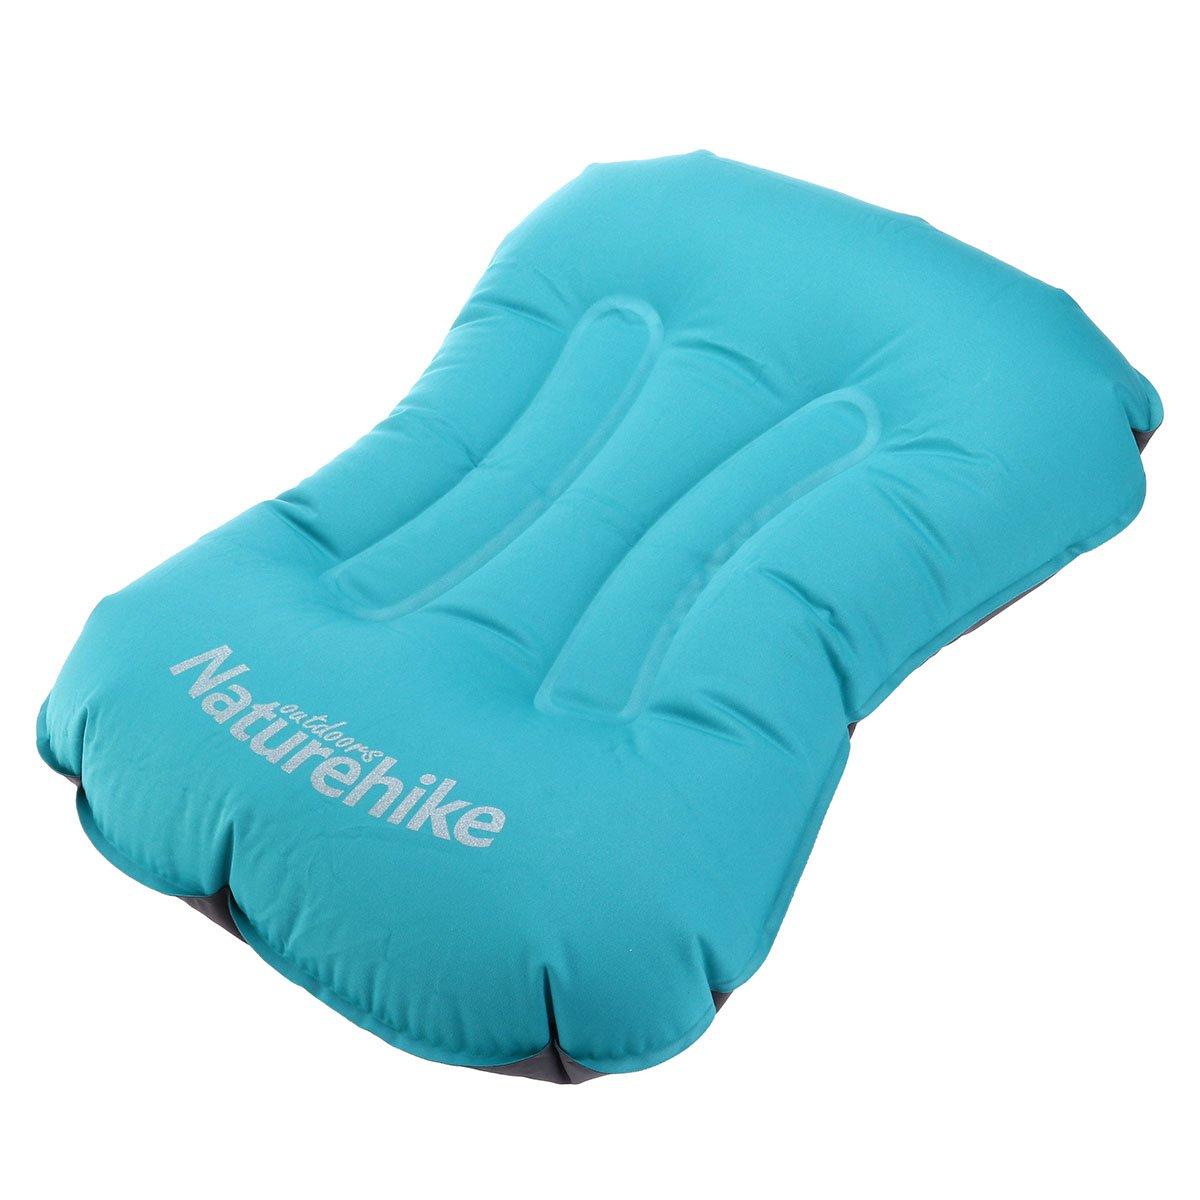 WINOMO Inflating Pillow for枕快適なポータブルコンパクトアウトドアキャンプハイキングバックパッキング、旅行(ブルー) B073GSHN42